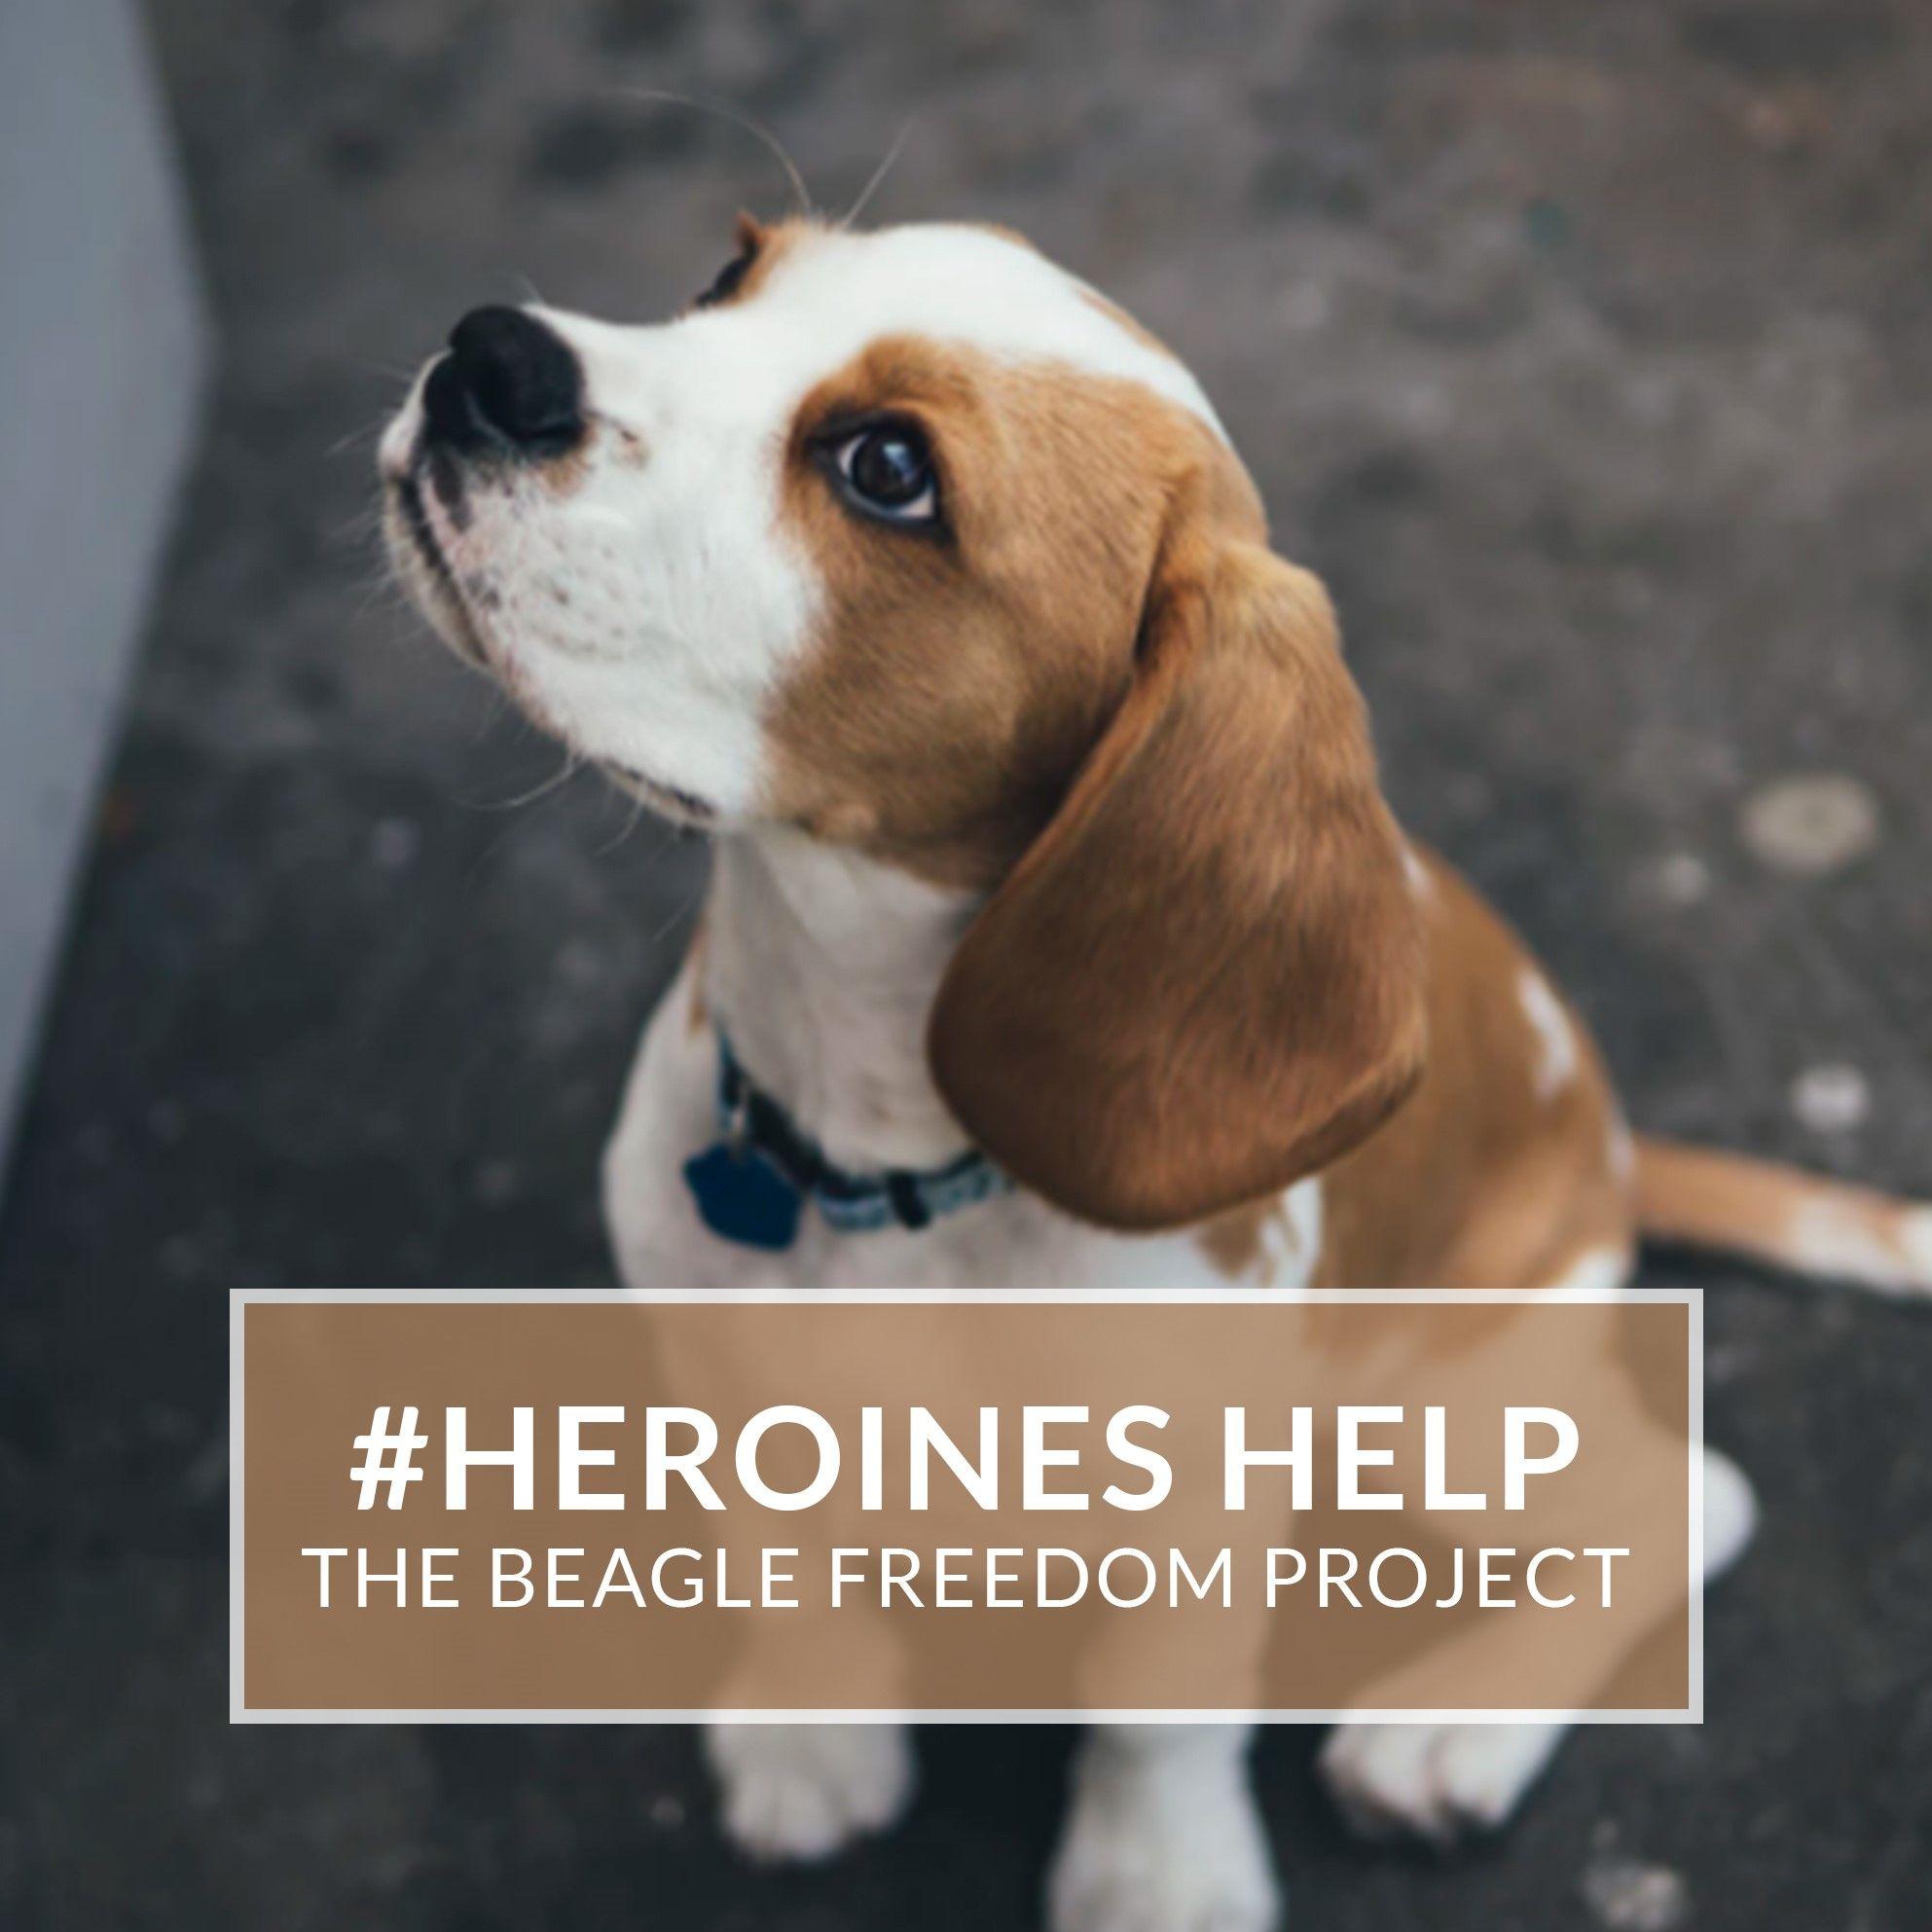 Heroineshelp The Beagle Freedom Project Beagle Beagle Breeds